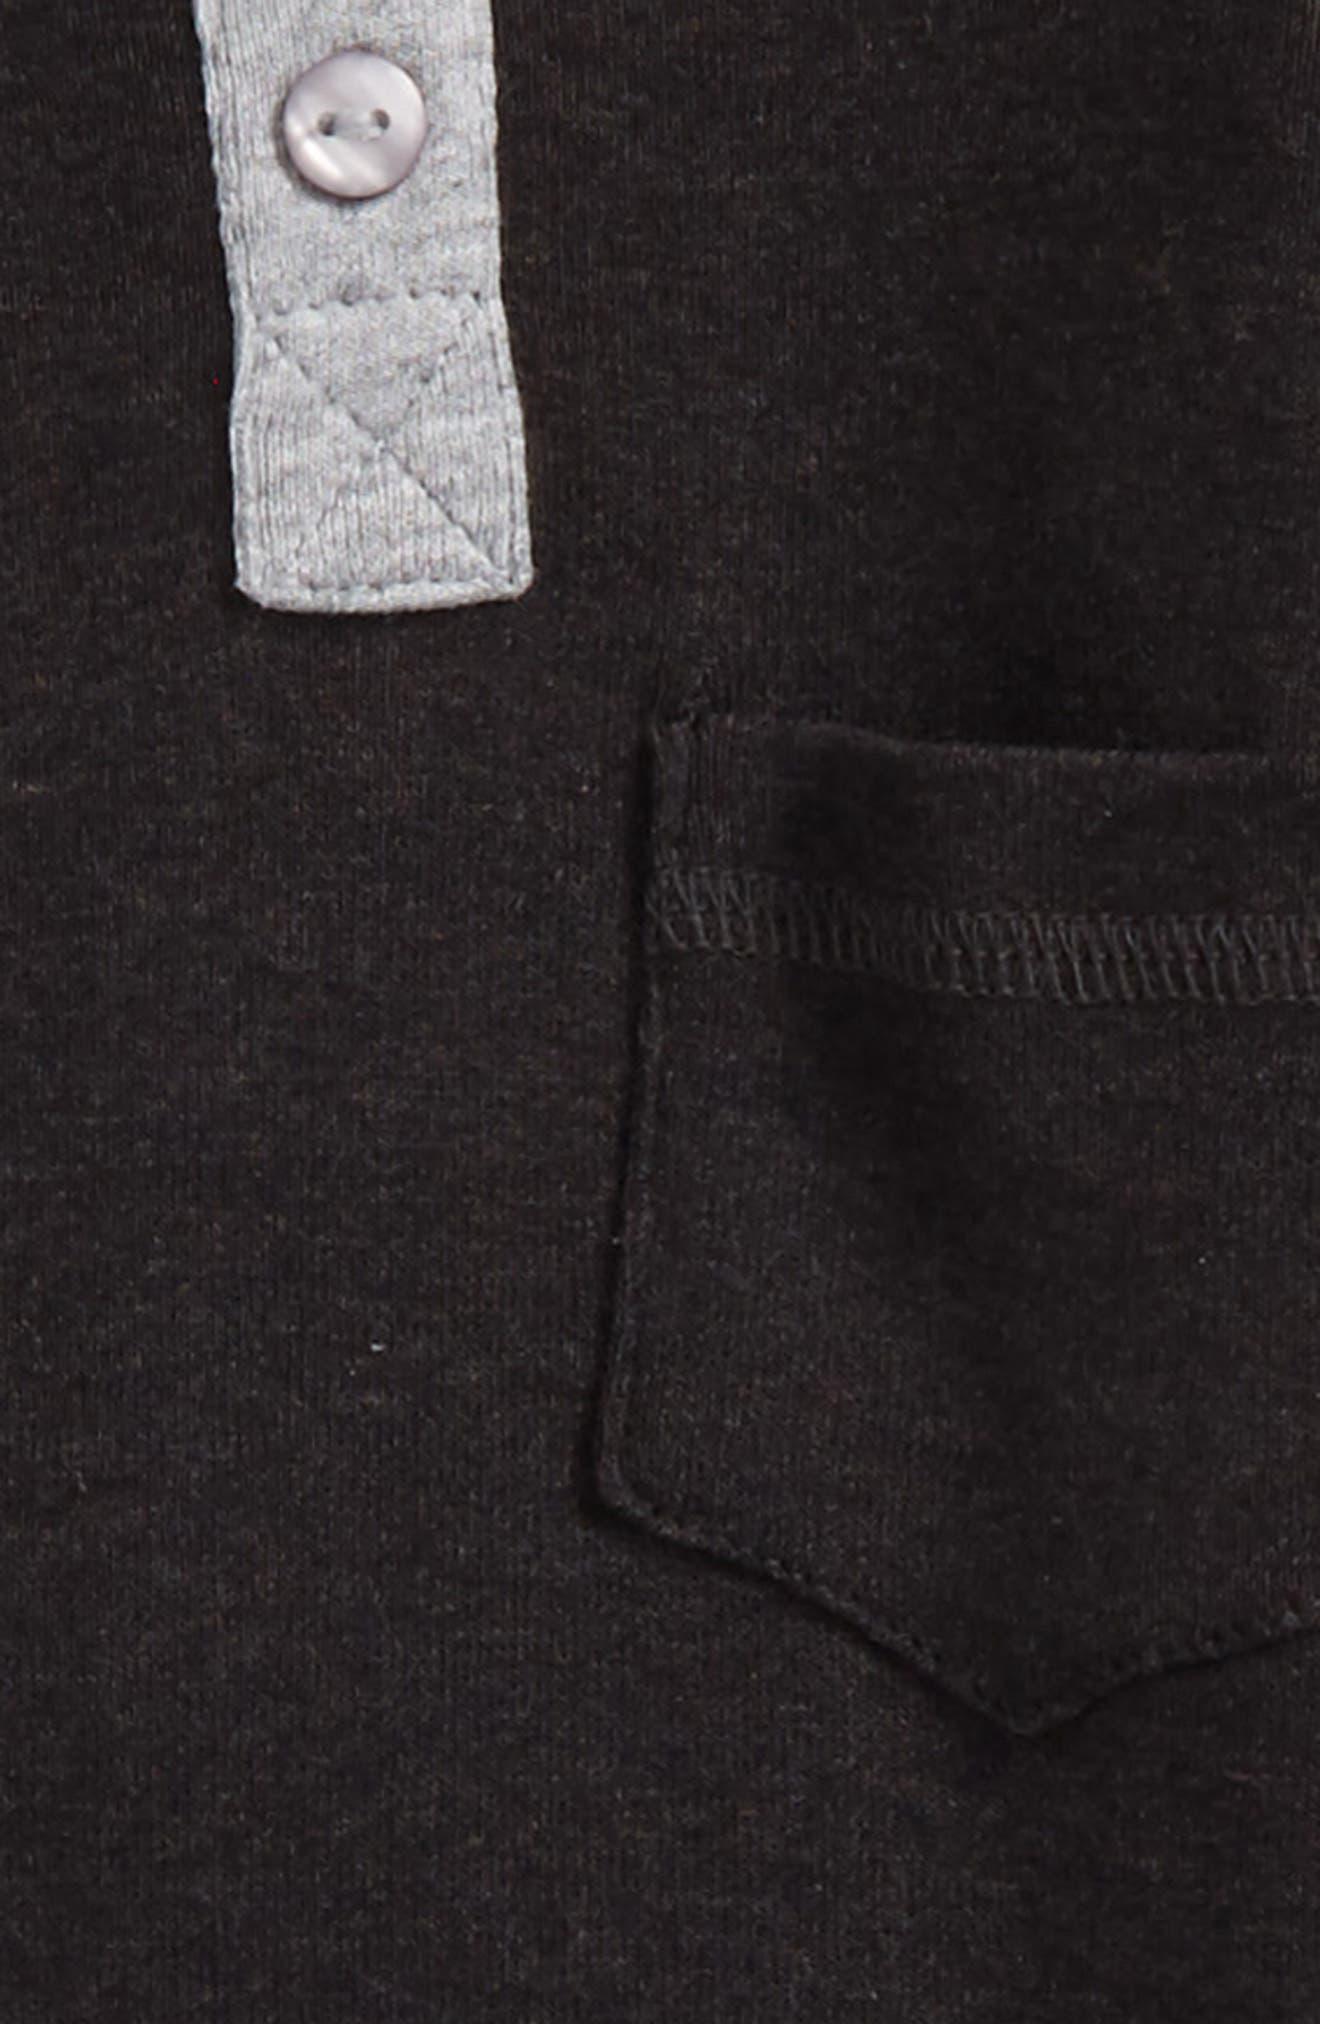 Organic Cotton Henley Romper,                             Alternate thumbnail 2, color,                             Black Heather/ Heather Grey